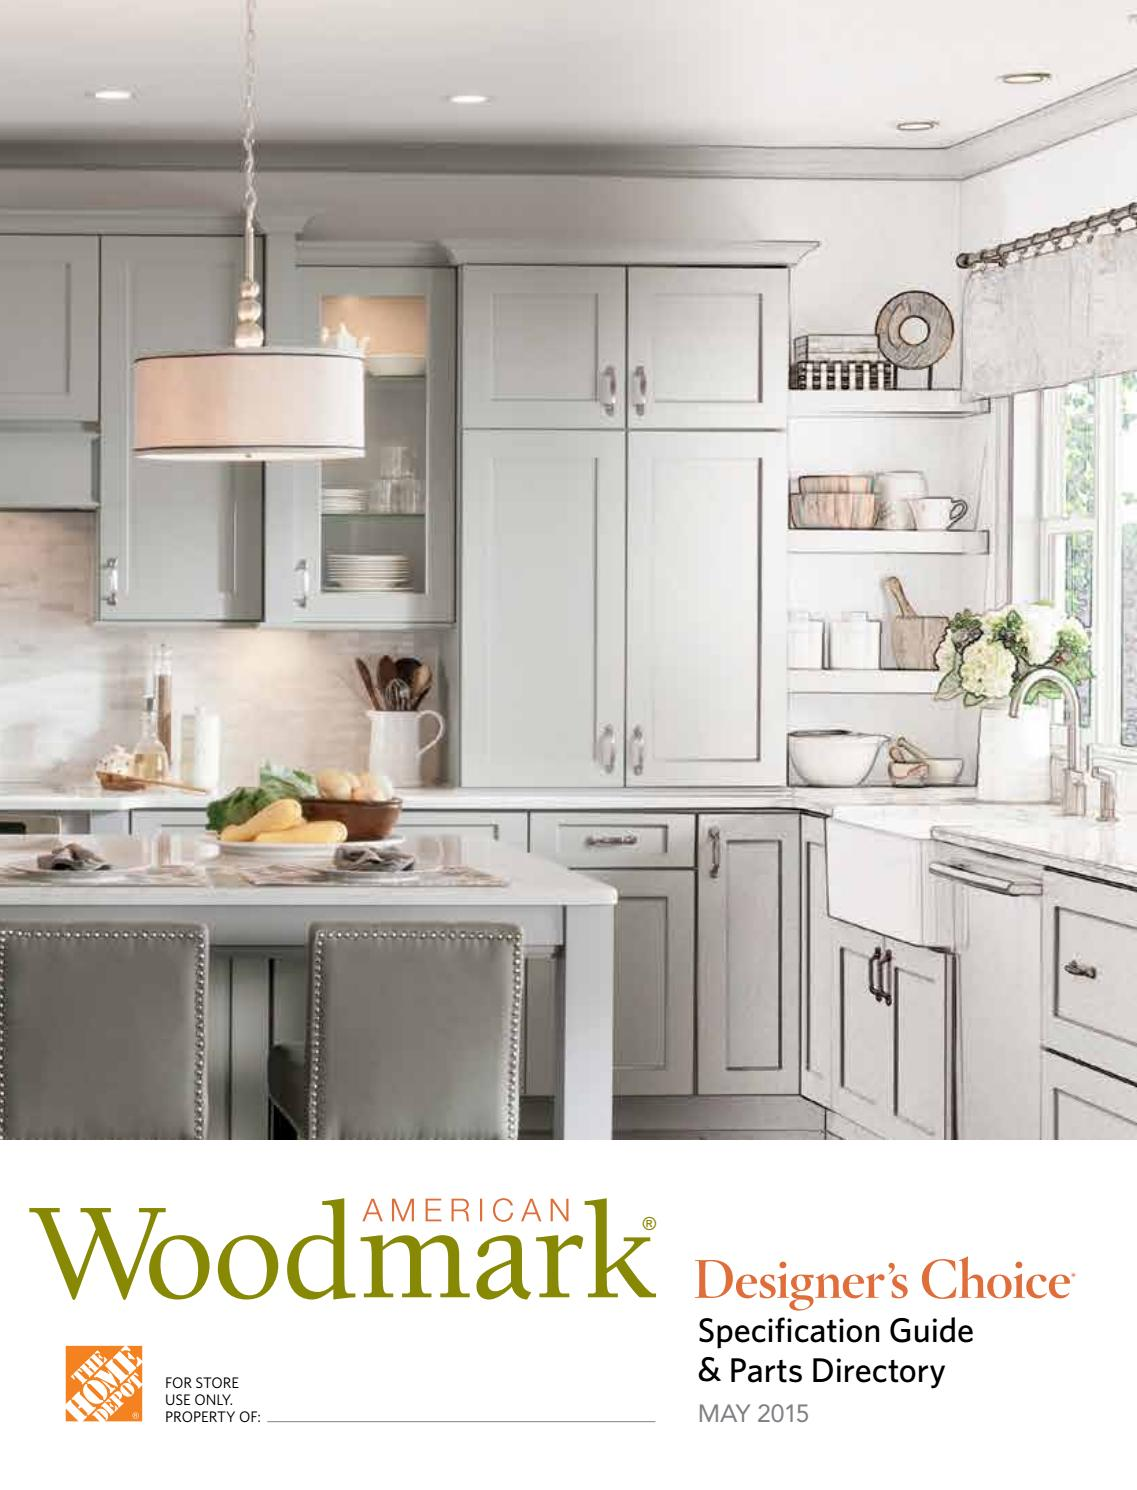 American Woodmark Kitchen Cabinet Sizes | www.stkittsvilla.com